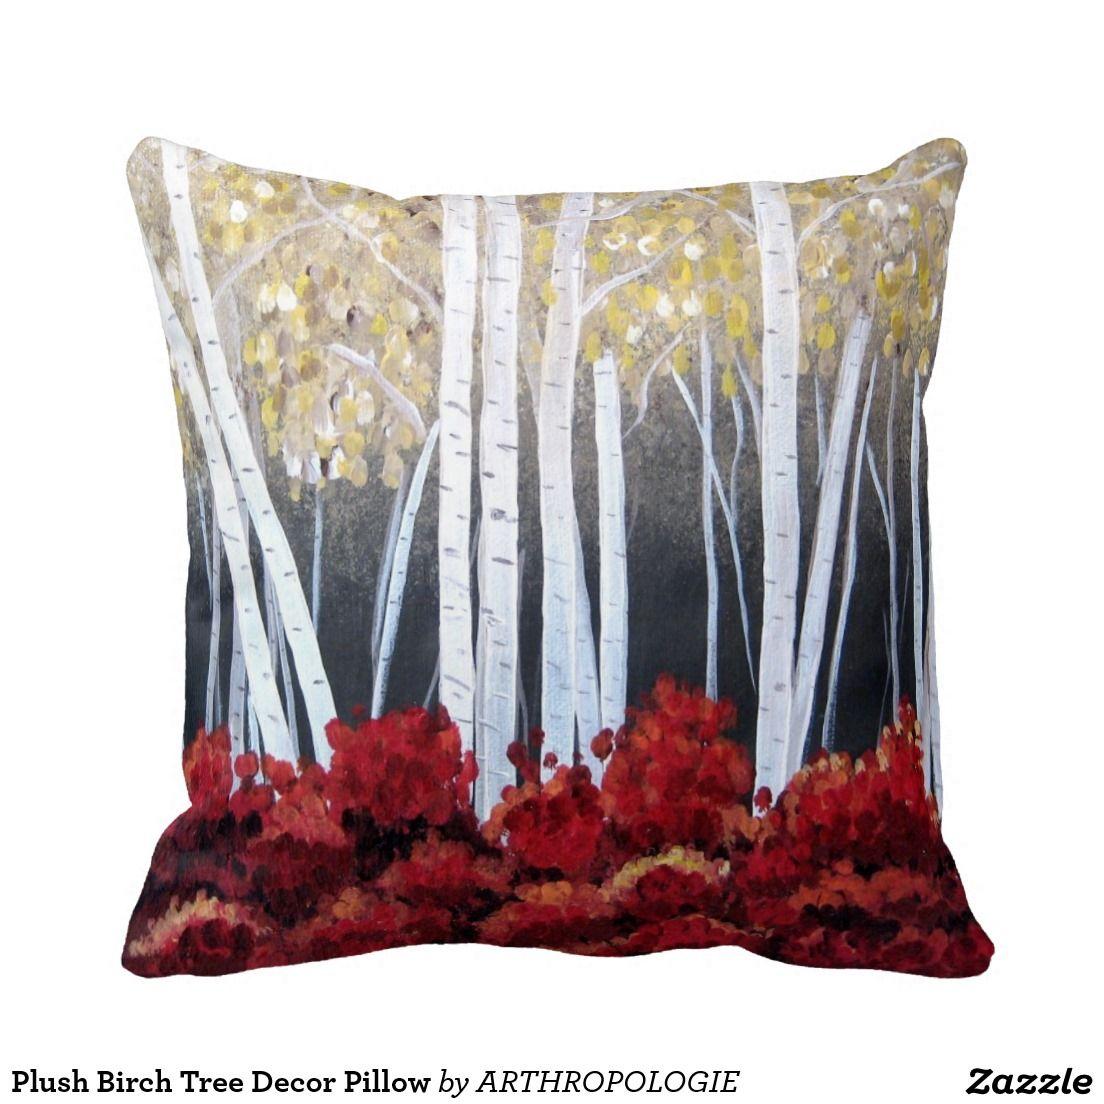 Plush Birch Tree Decor Pillow